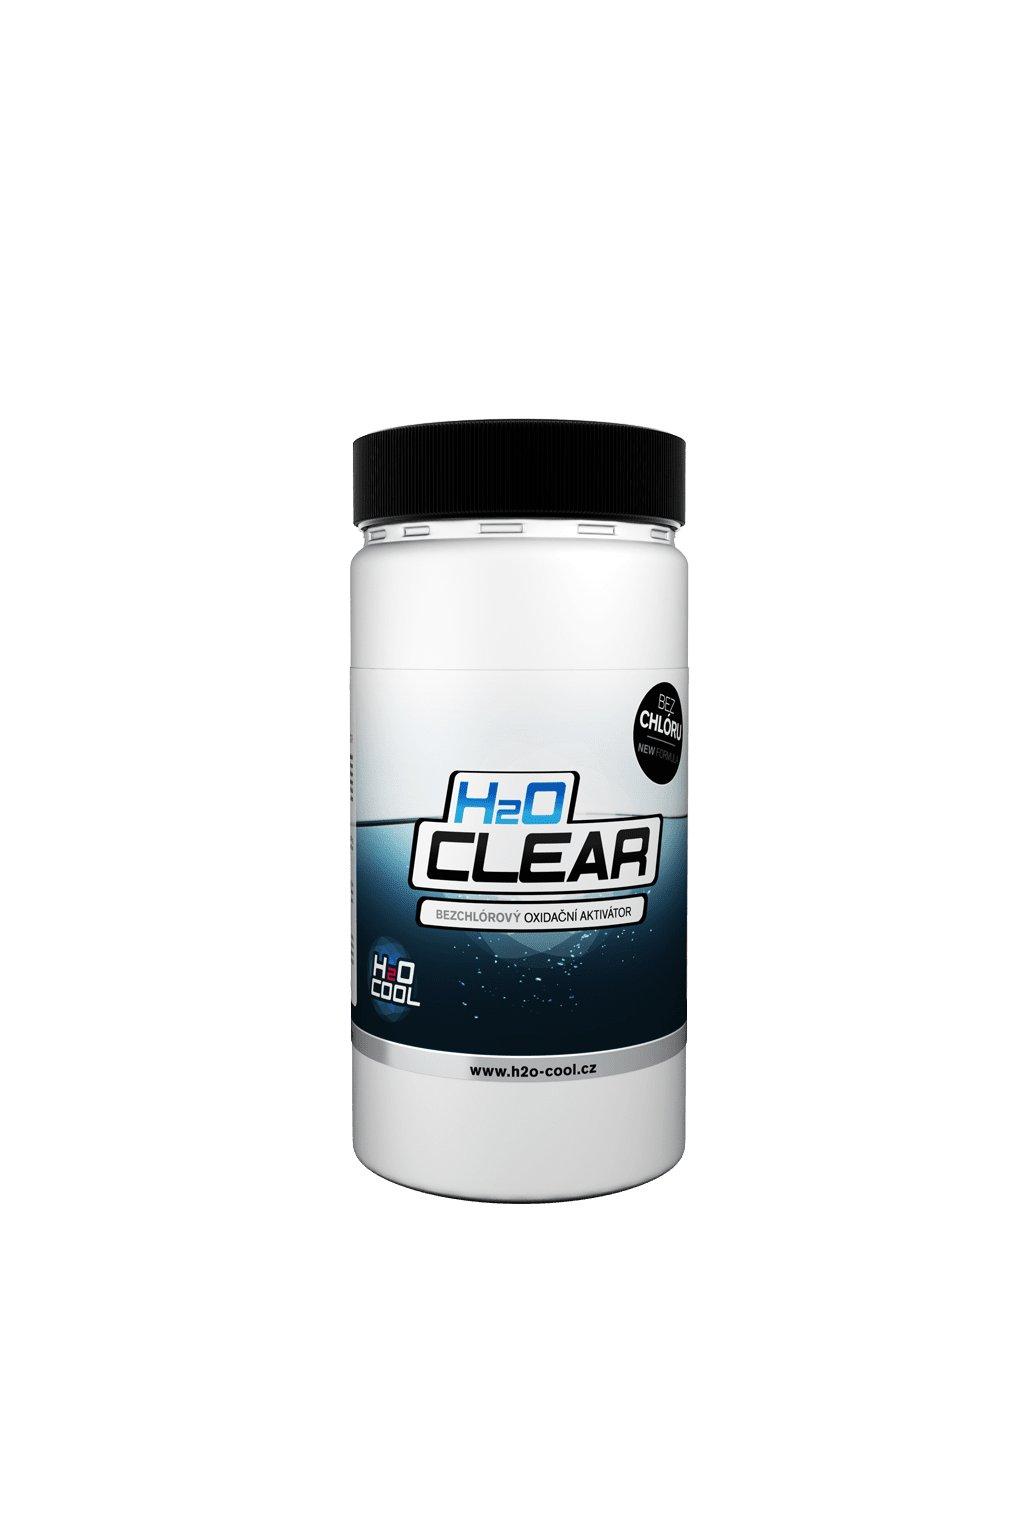 14 bezchlorova oxidace virivky h2o clear